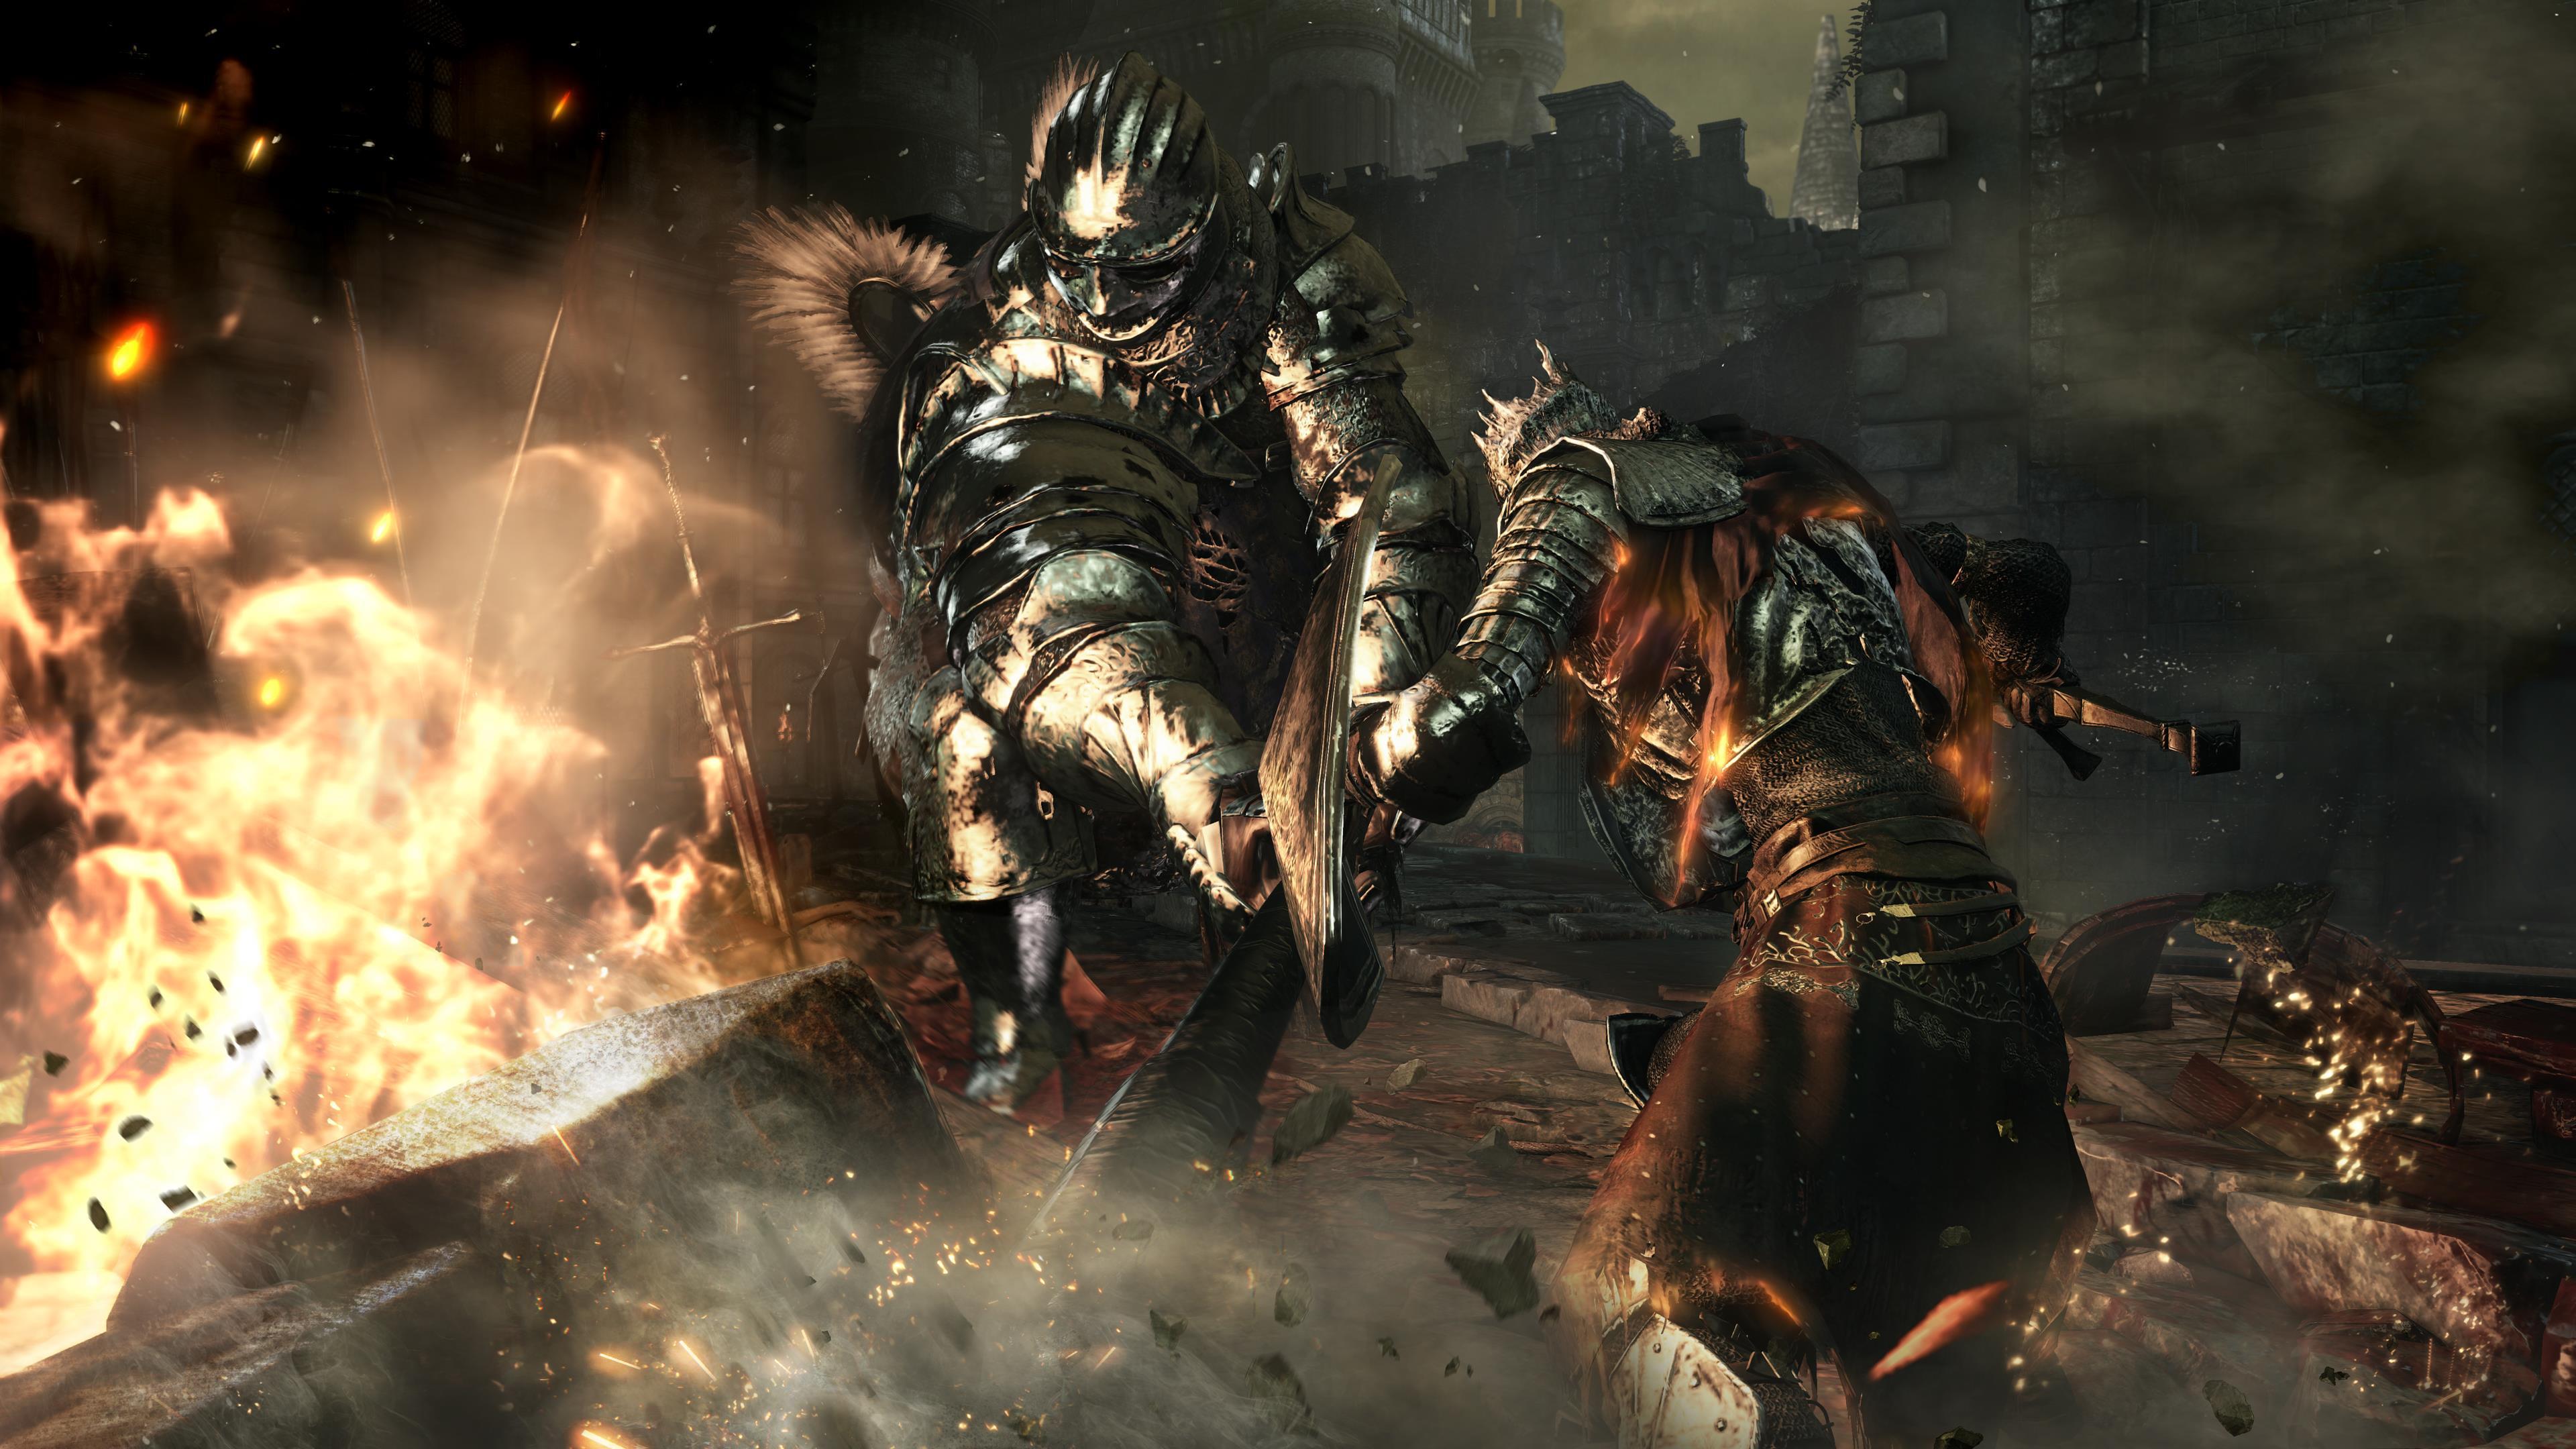 Dark_Souls_3_E3_screenshot_12